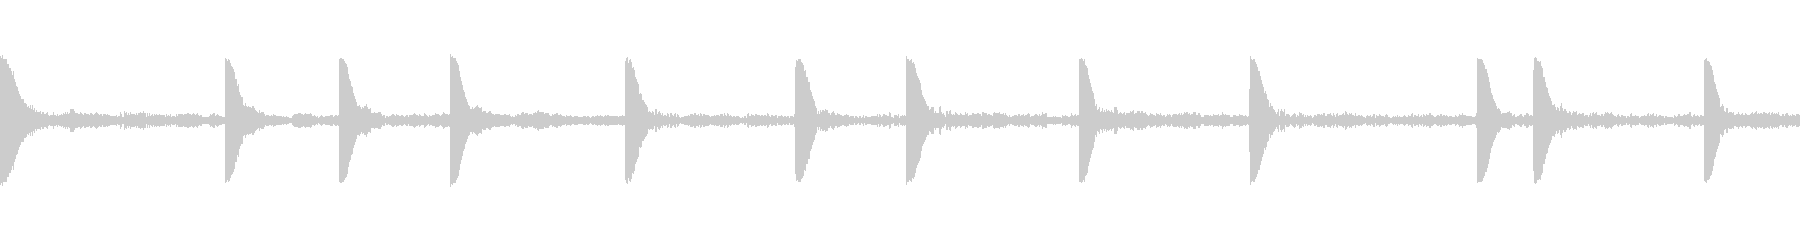 EDM PluckLoop1 音楽制作用の未再生の波形